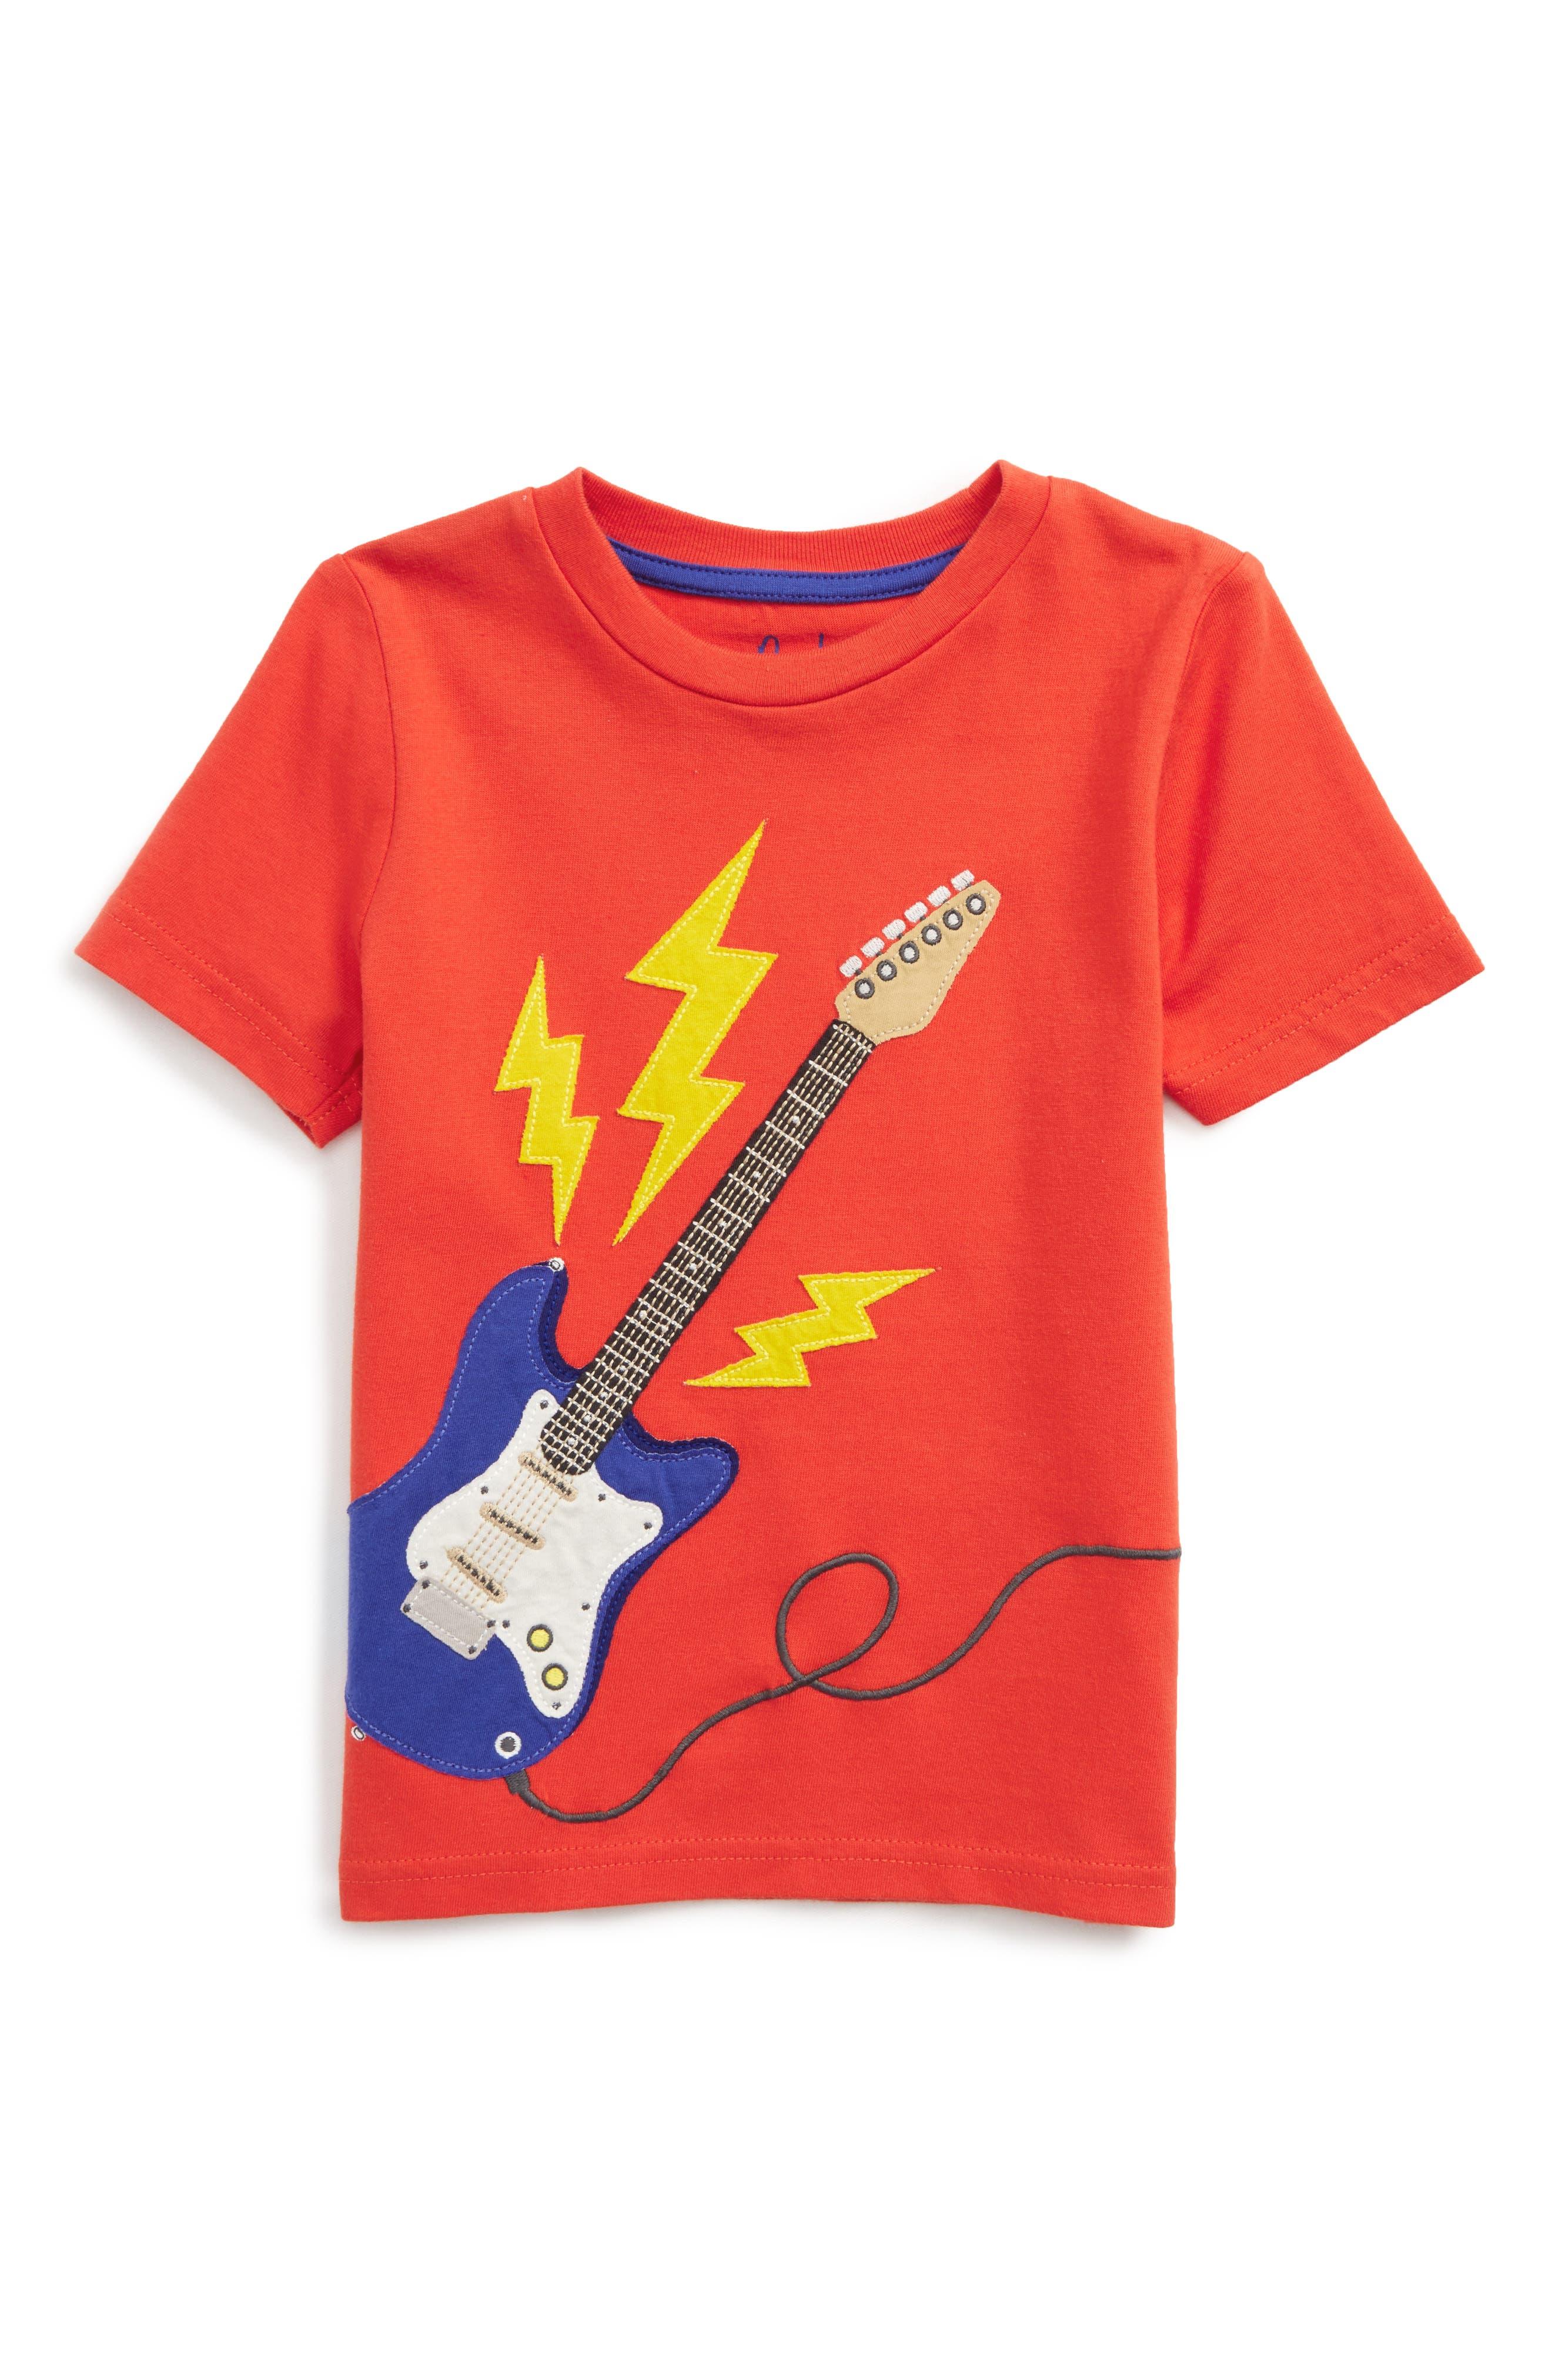 Main Image - Mini Boden Music Appliqué T-Shirt (Toddler Boys, Little Boys & Big Boys)